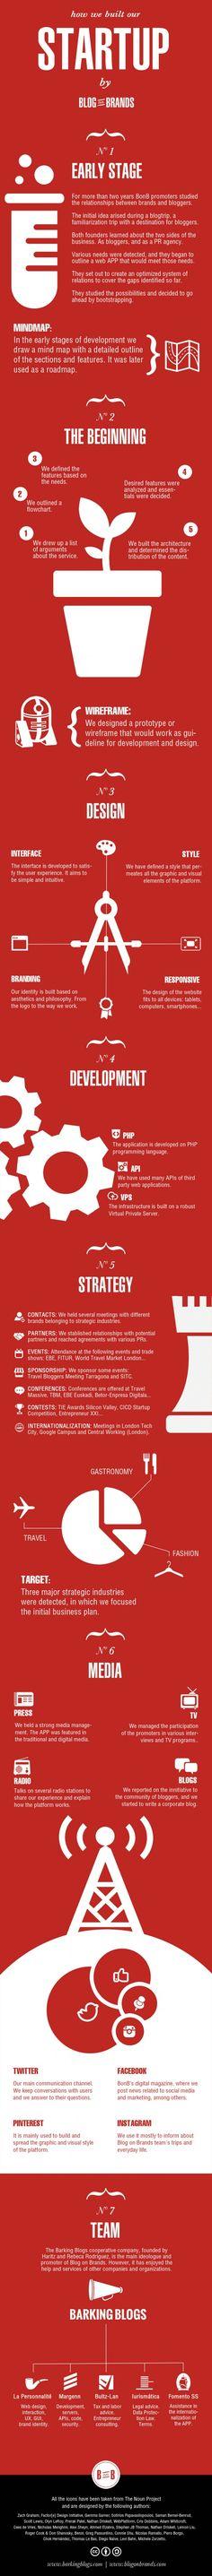 How we built our #startup http://blogonbrands.com #brands #blogs #startups #smm #socialmedia